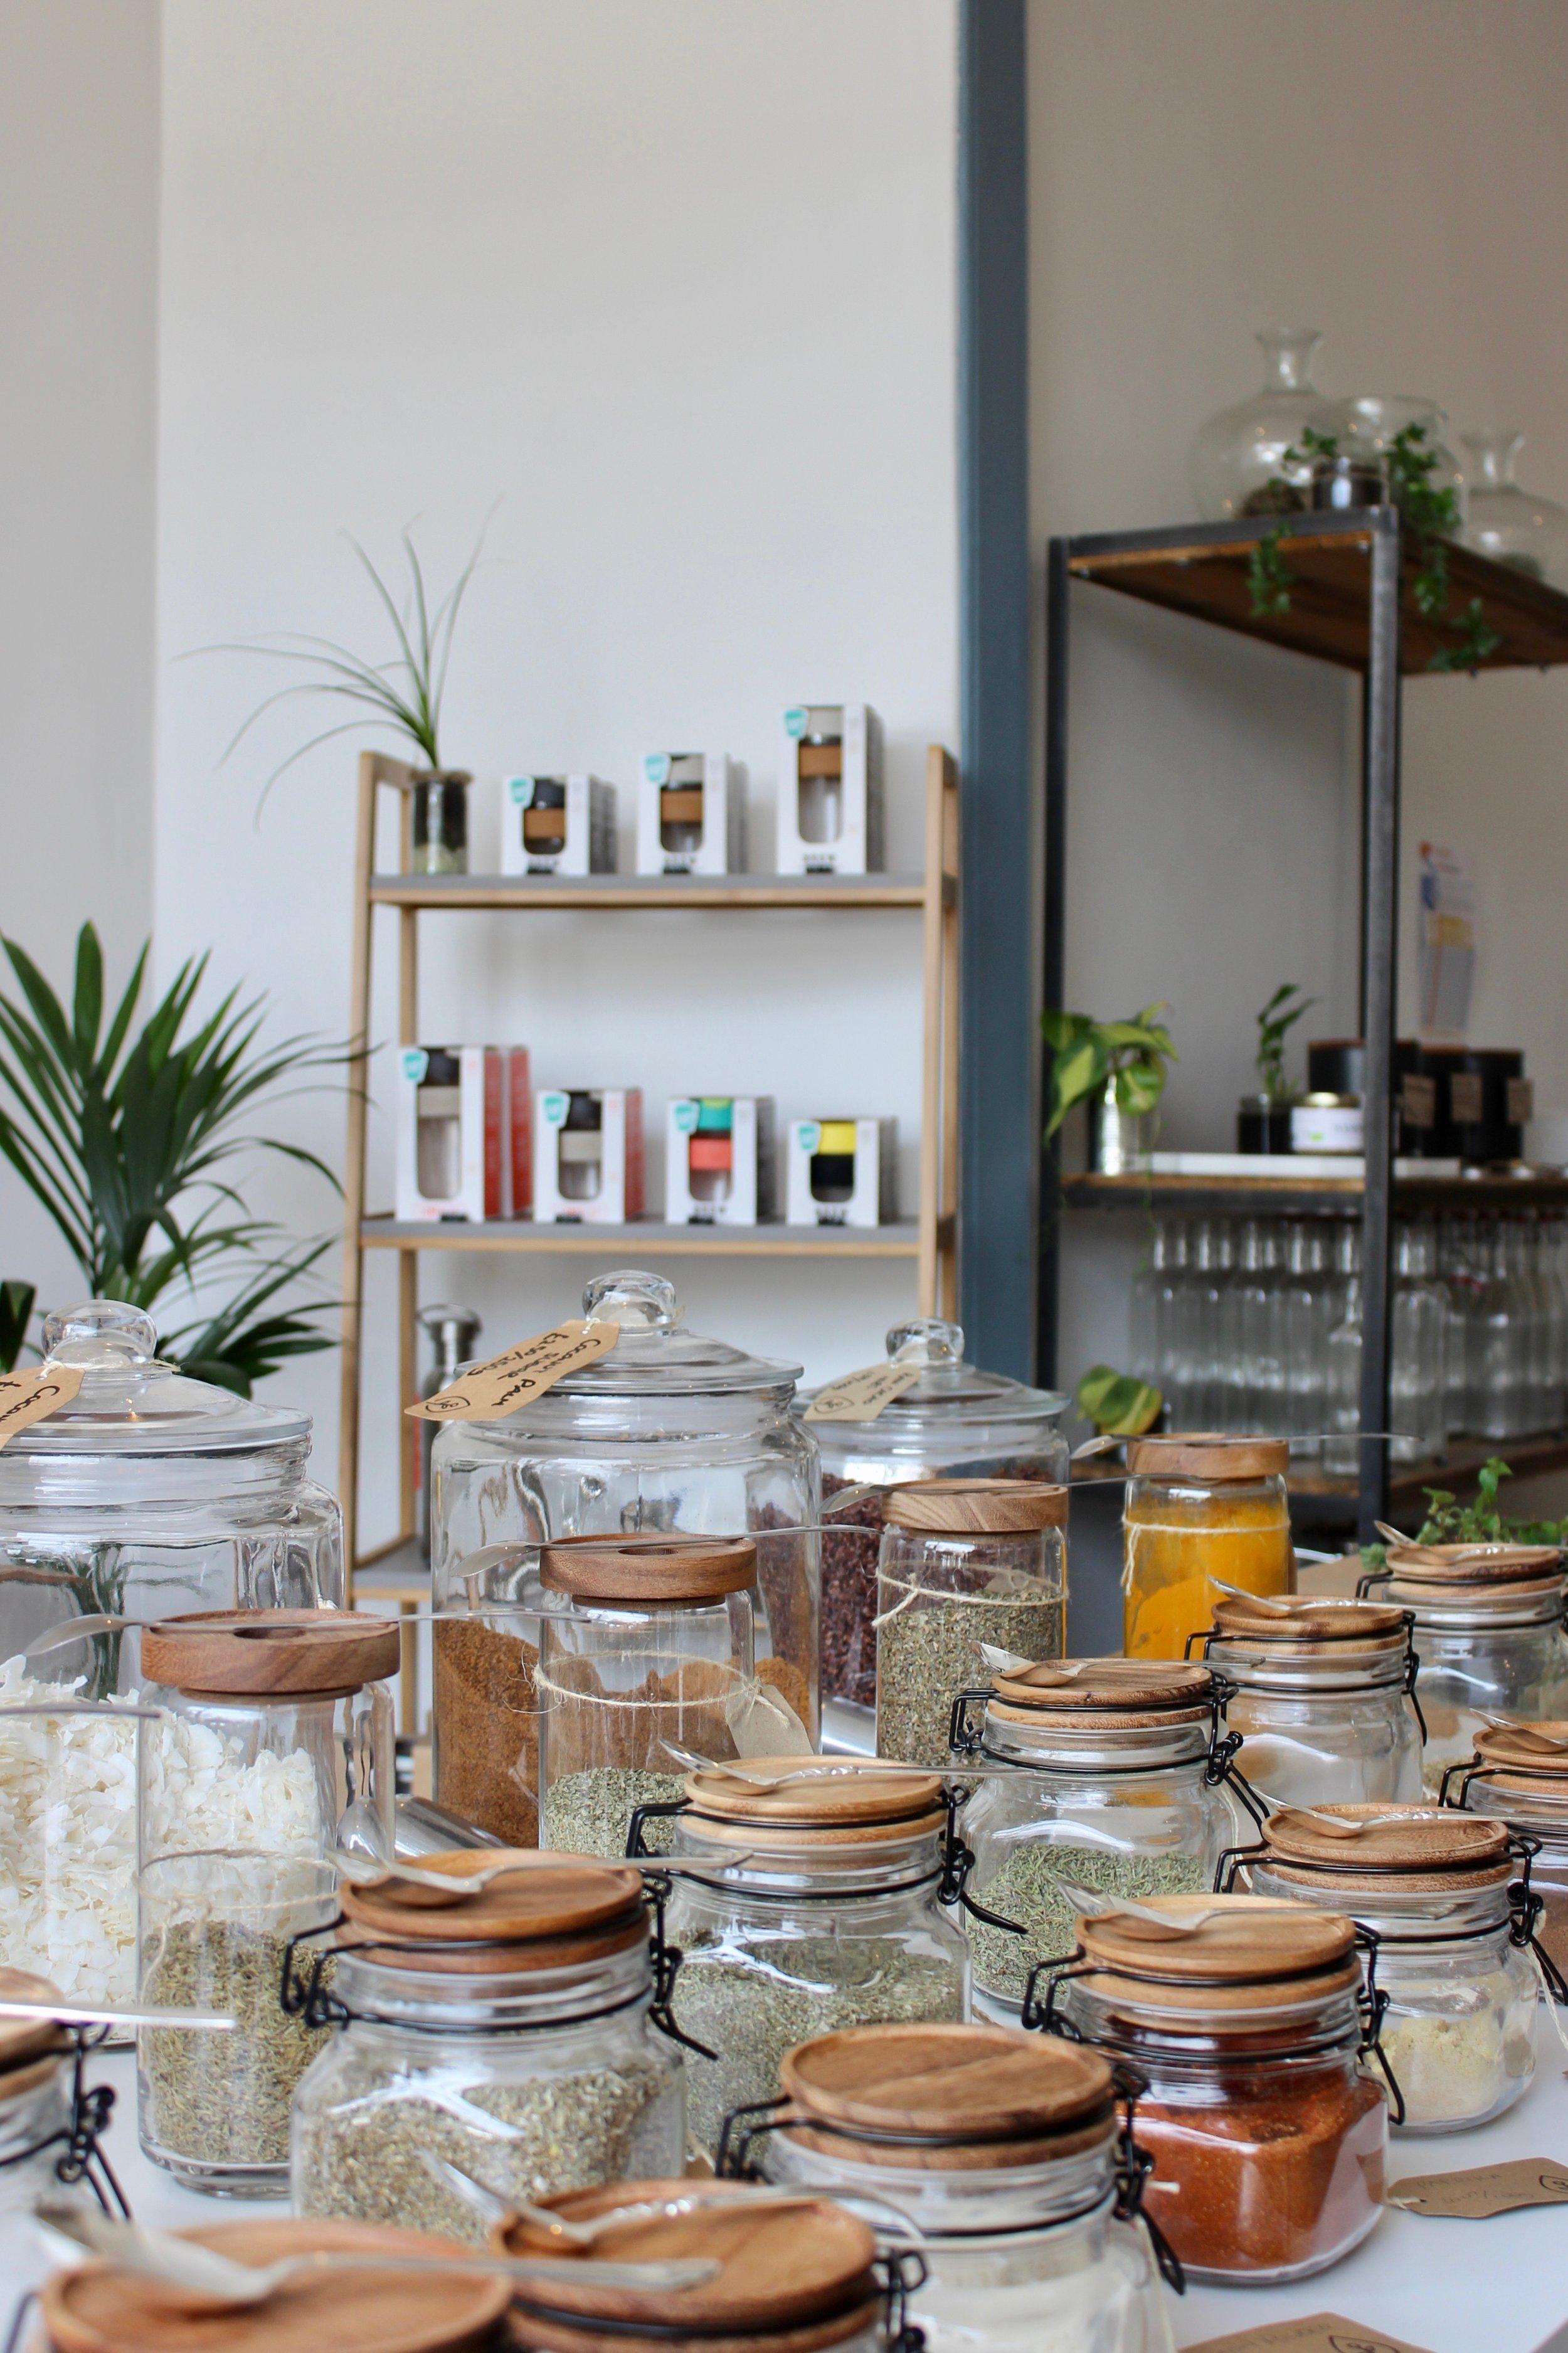 Zero waste, bulk foods grocery shopping in London, United Kingdom   Litterless